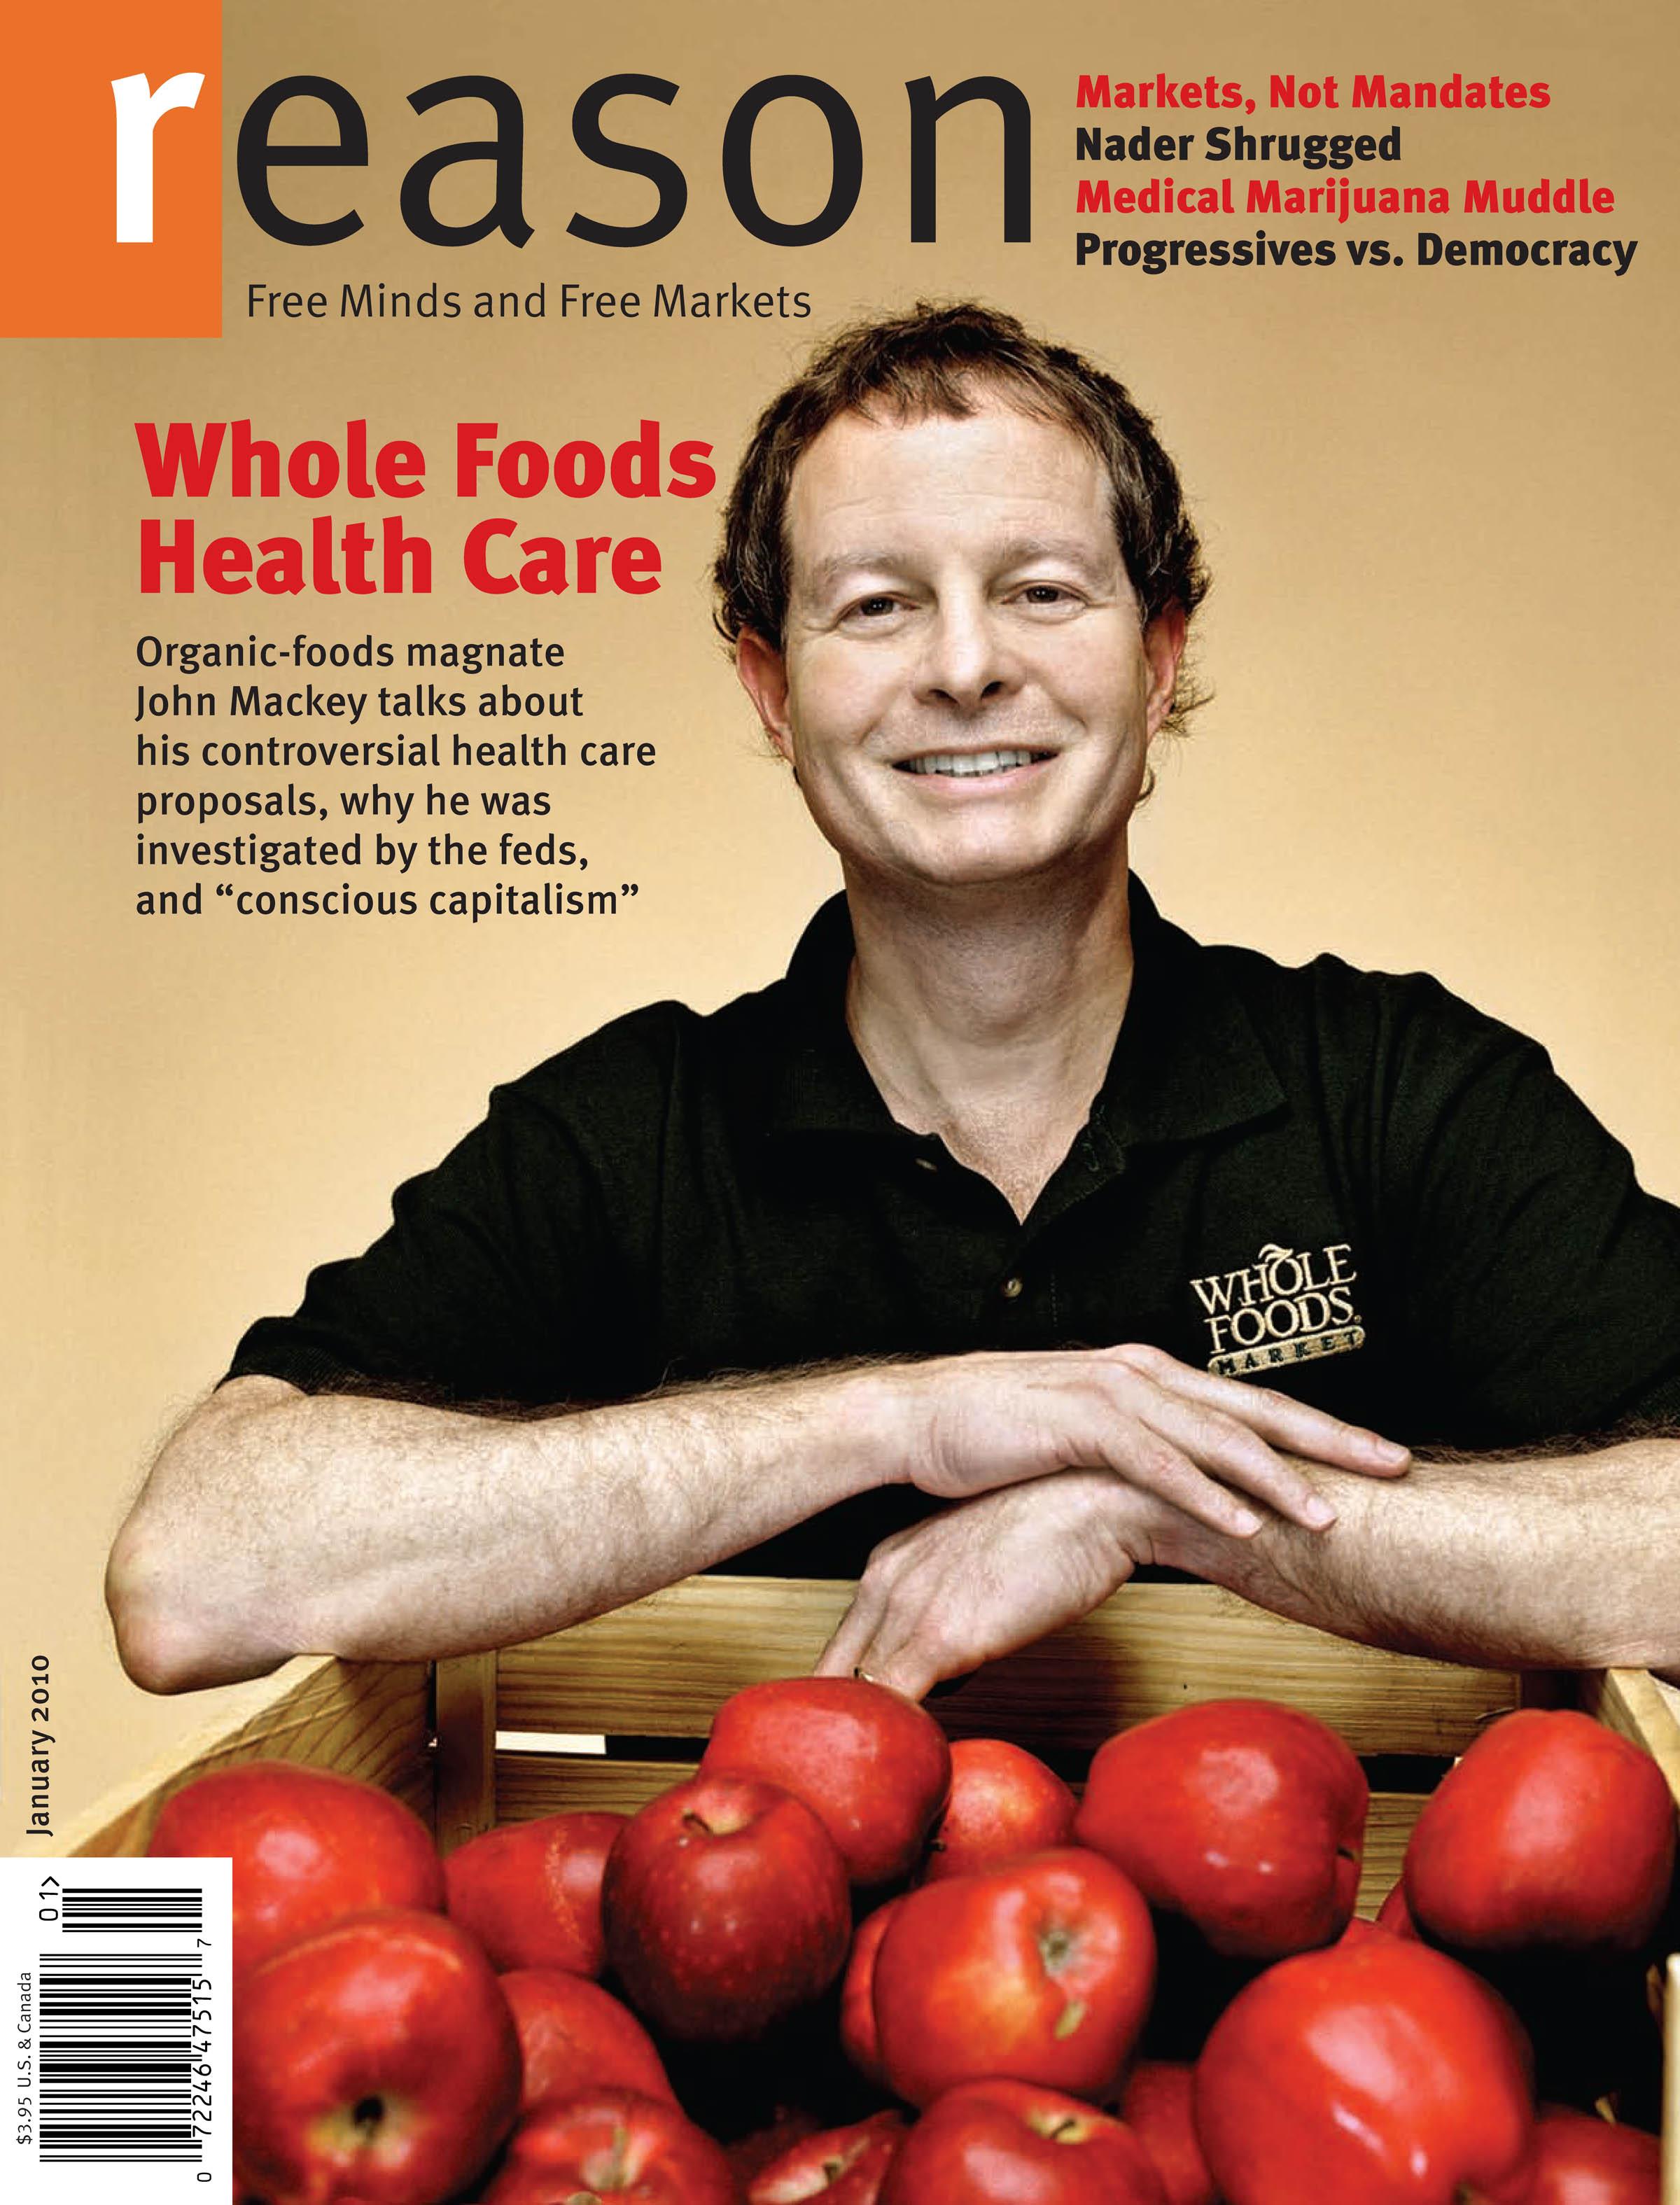 Reason Magazine, January 2010 cover image